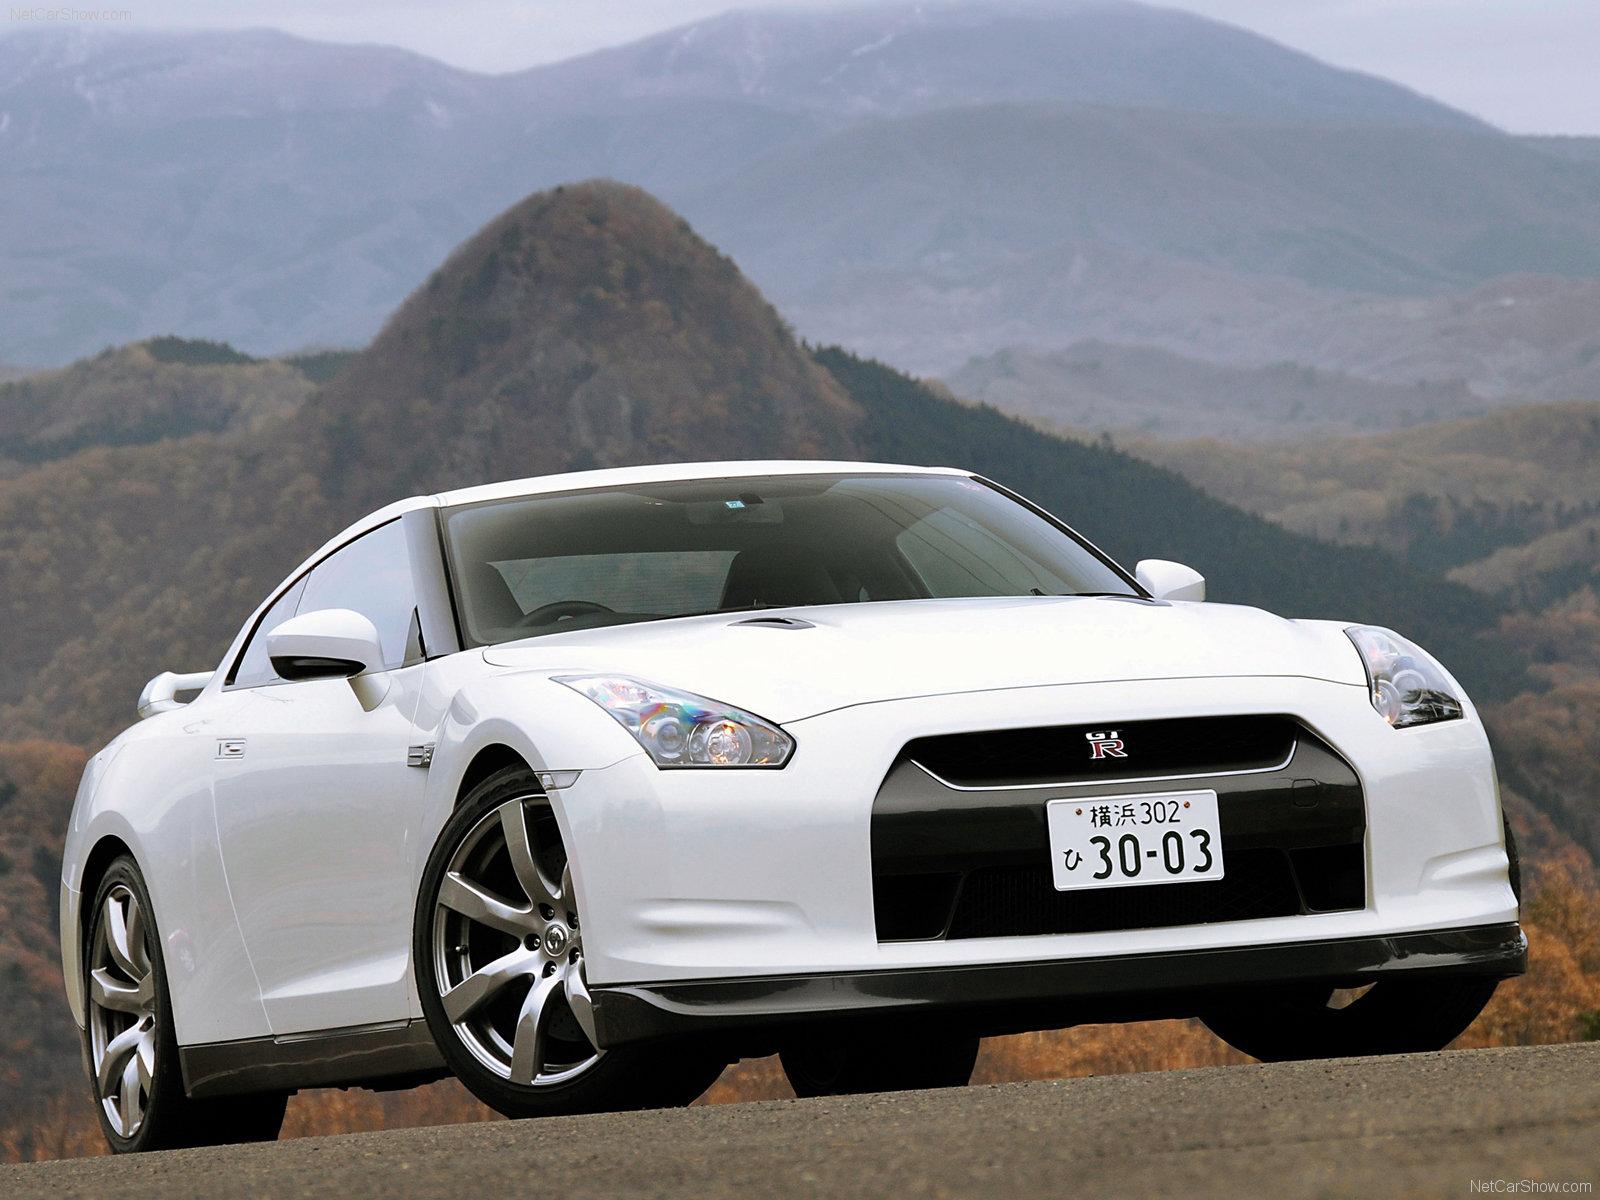 http://2.bp.blogspot.com/-UXSiAEGKYYY/UD5IxWca9bI/AAAAAAAADRQ/0L8h2S9ug2c/s1600/Nissan-GT-R_2008_1600x1200_wallpaper_01.jpg